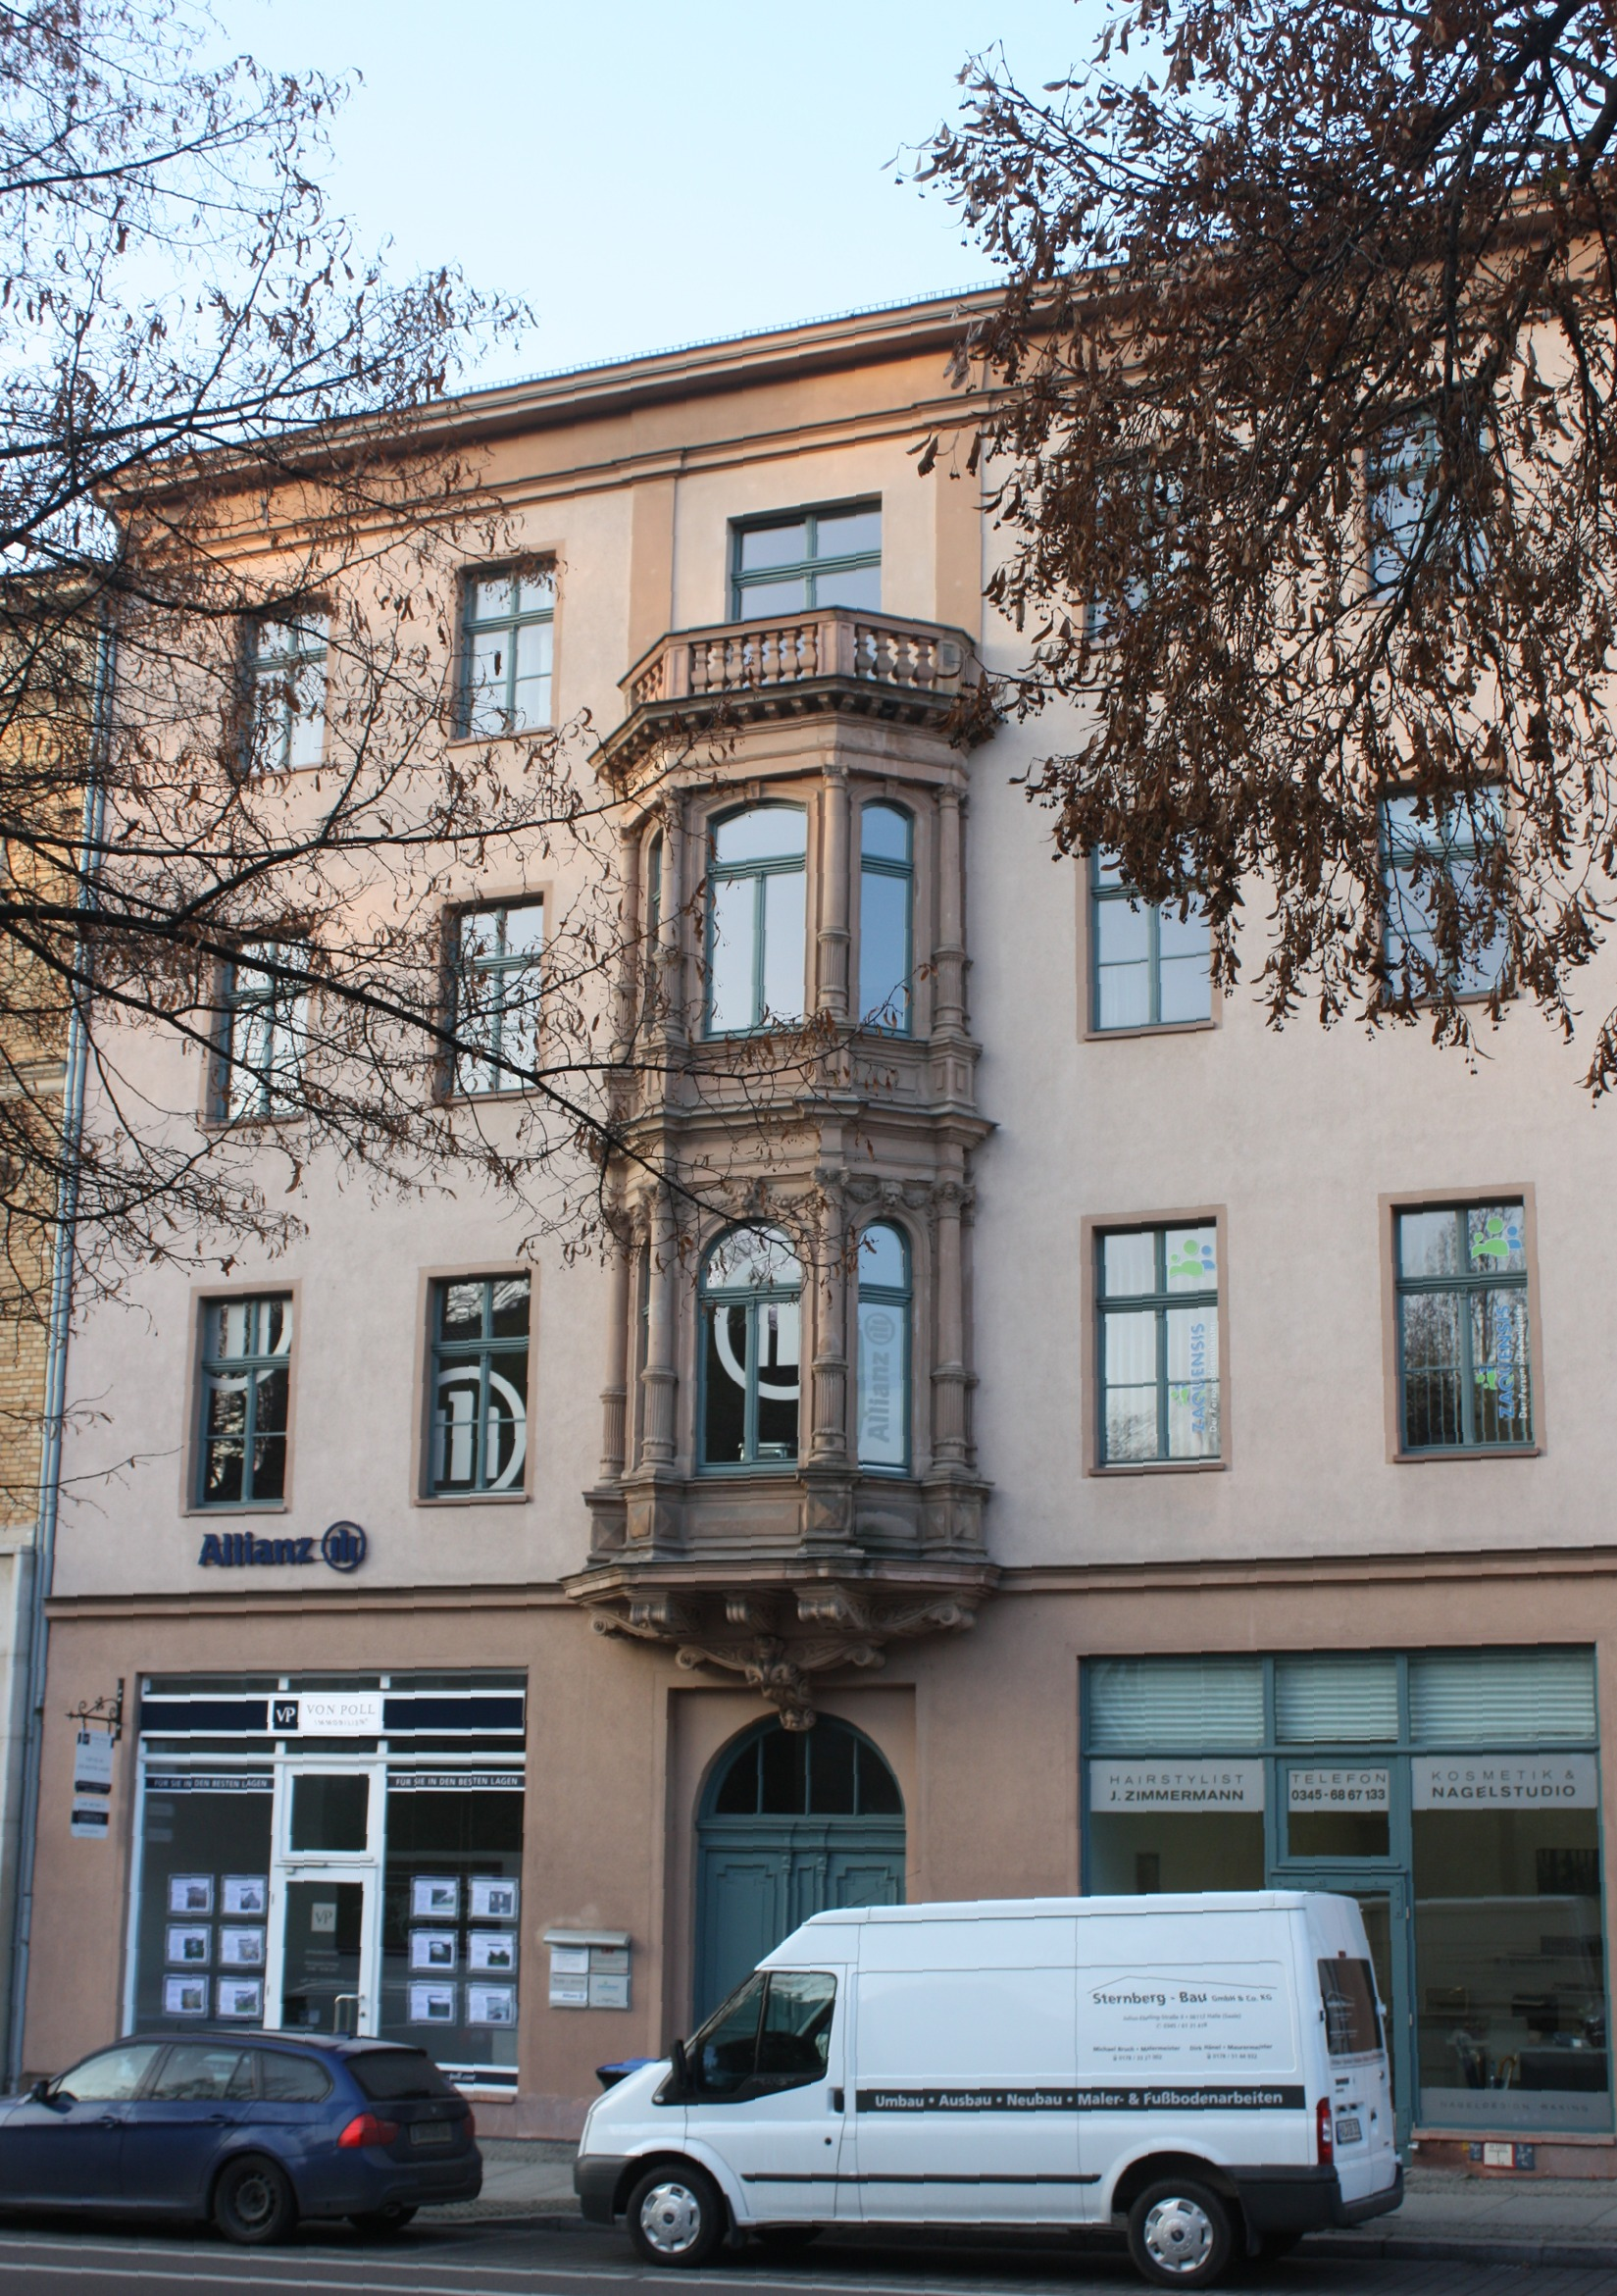 Haus Mieten Halle Saale : file halle saale haus hansering 8 jpg wikimedia commons ~ Watch28wear.com Haus und Dekorationen